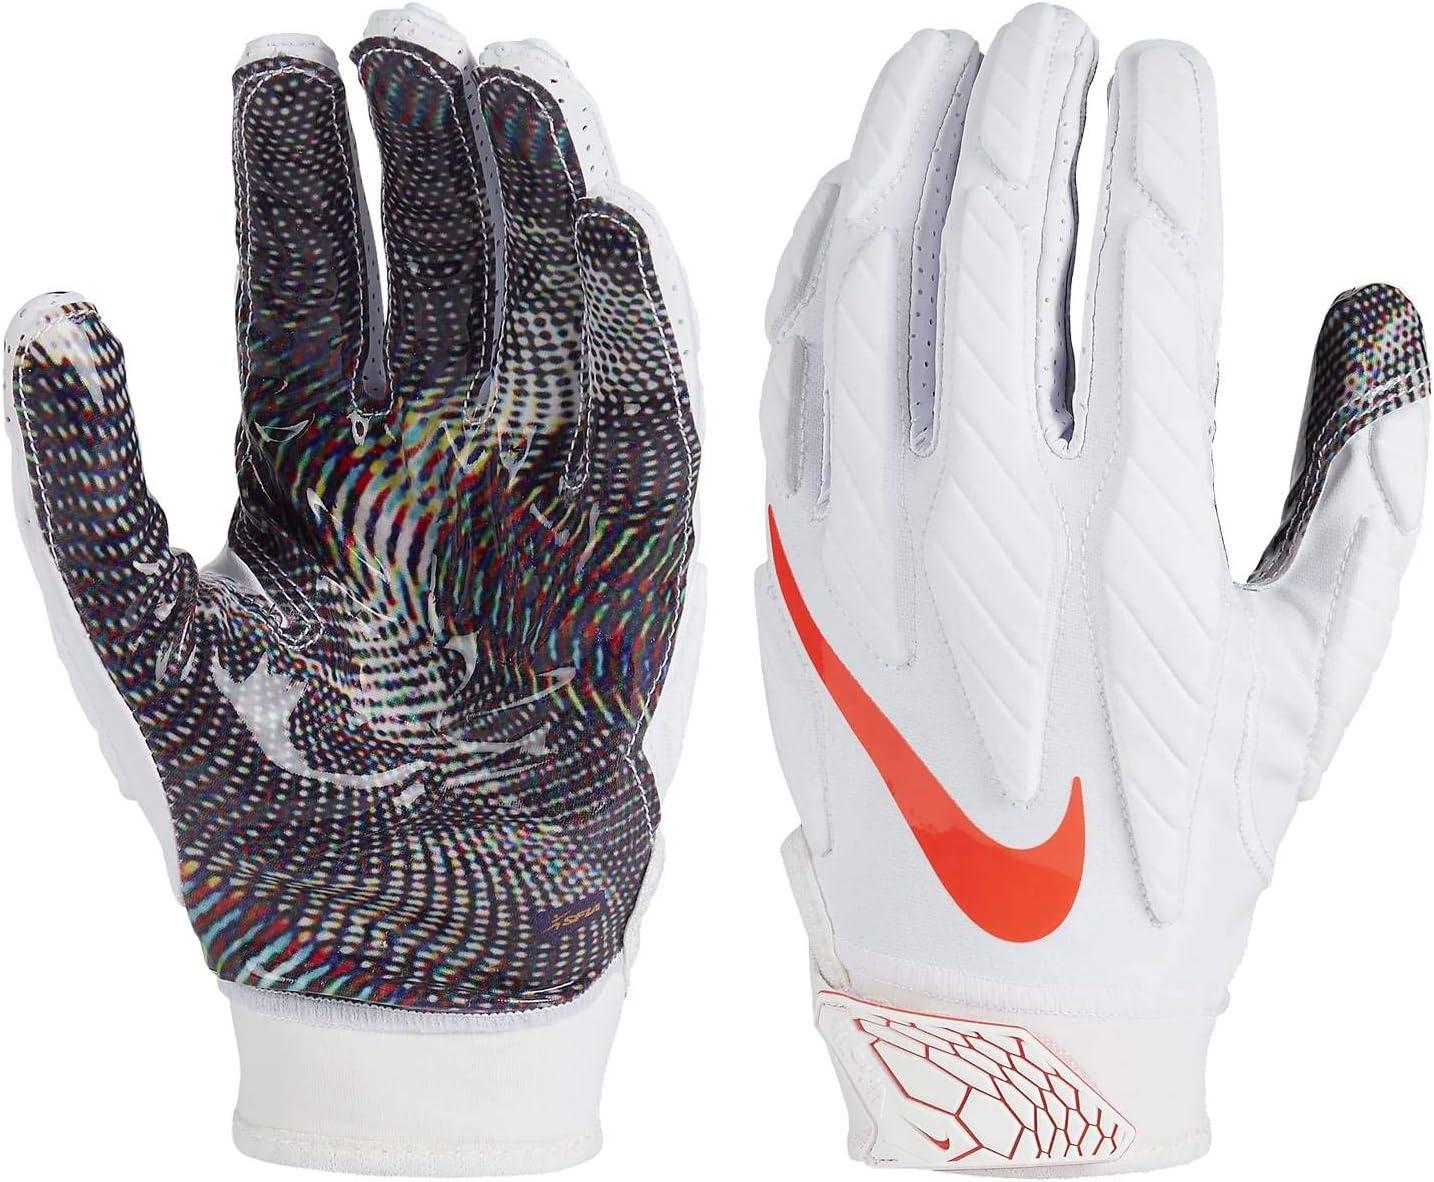 Vagabundo pintar desempleo  Amazon.com : Nike Superbad 5.0 Adult Football Gloves : Sports & Outdoors